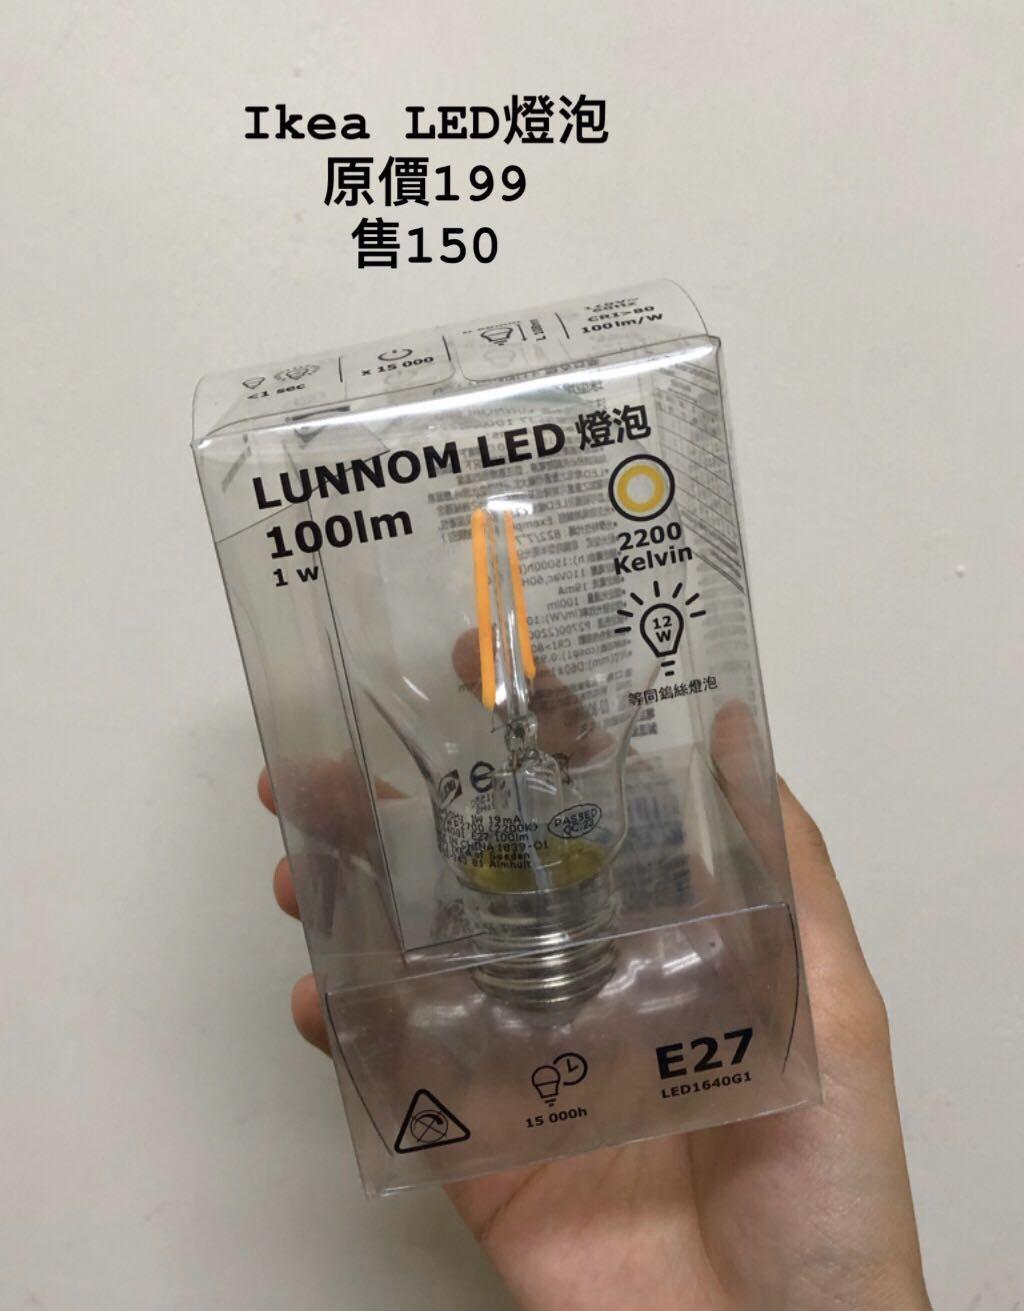 Ikea LED燈泡